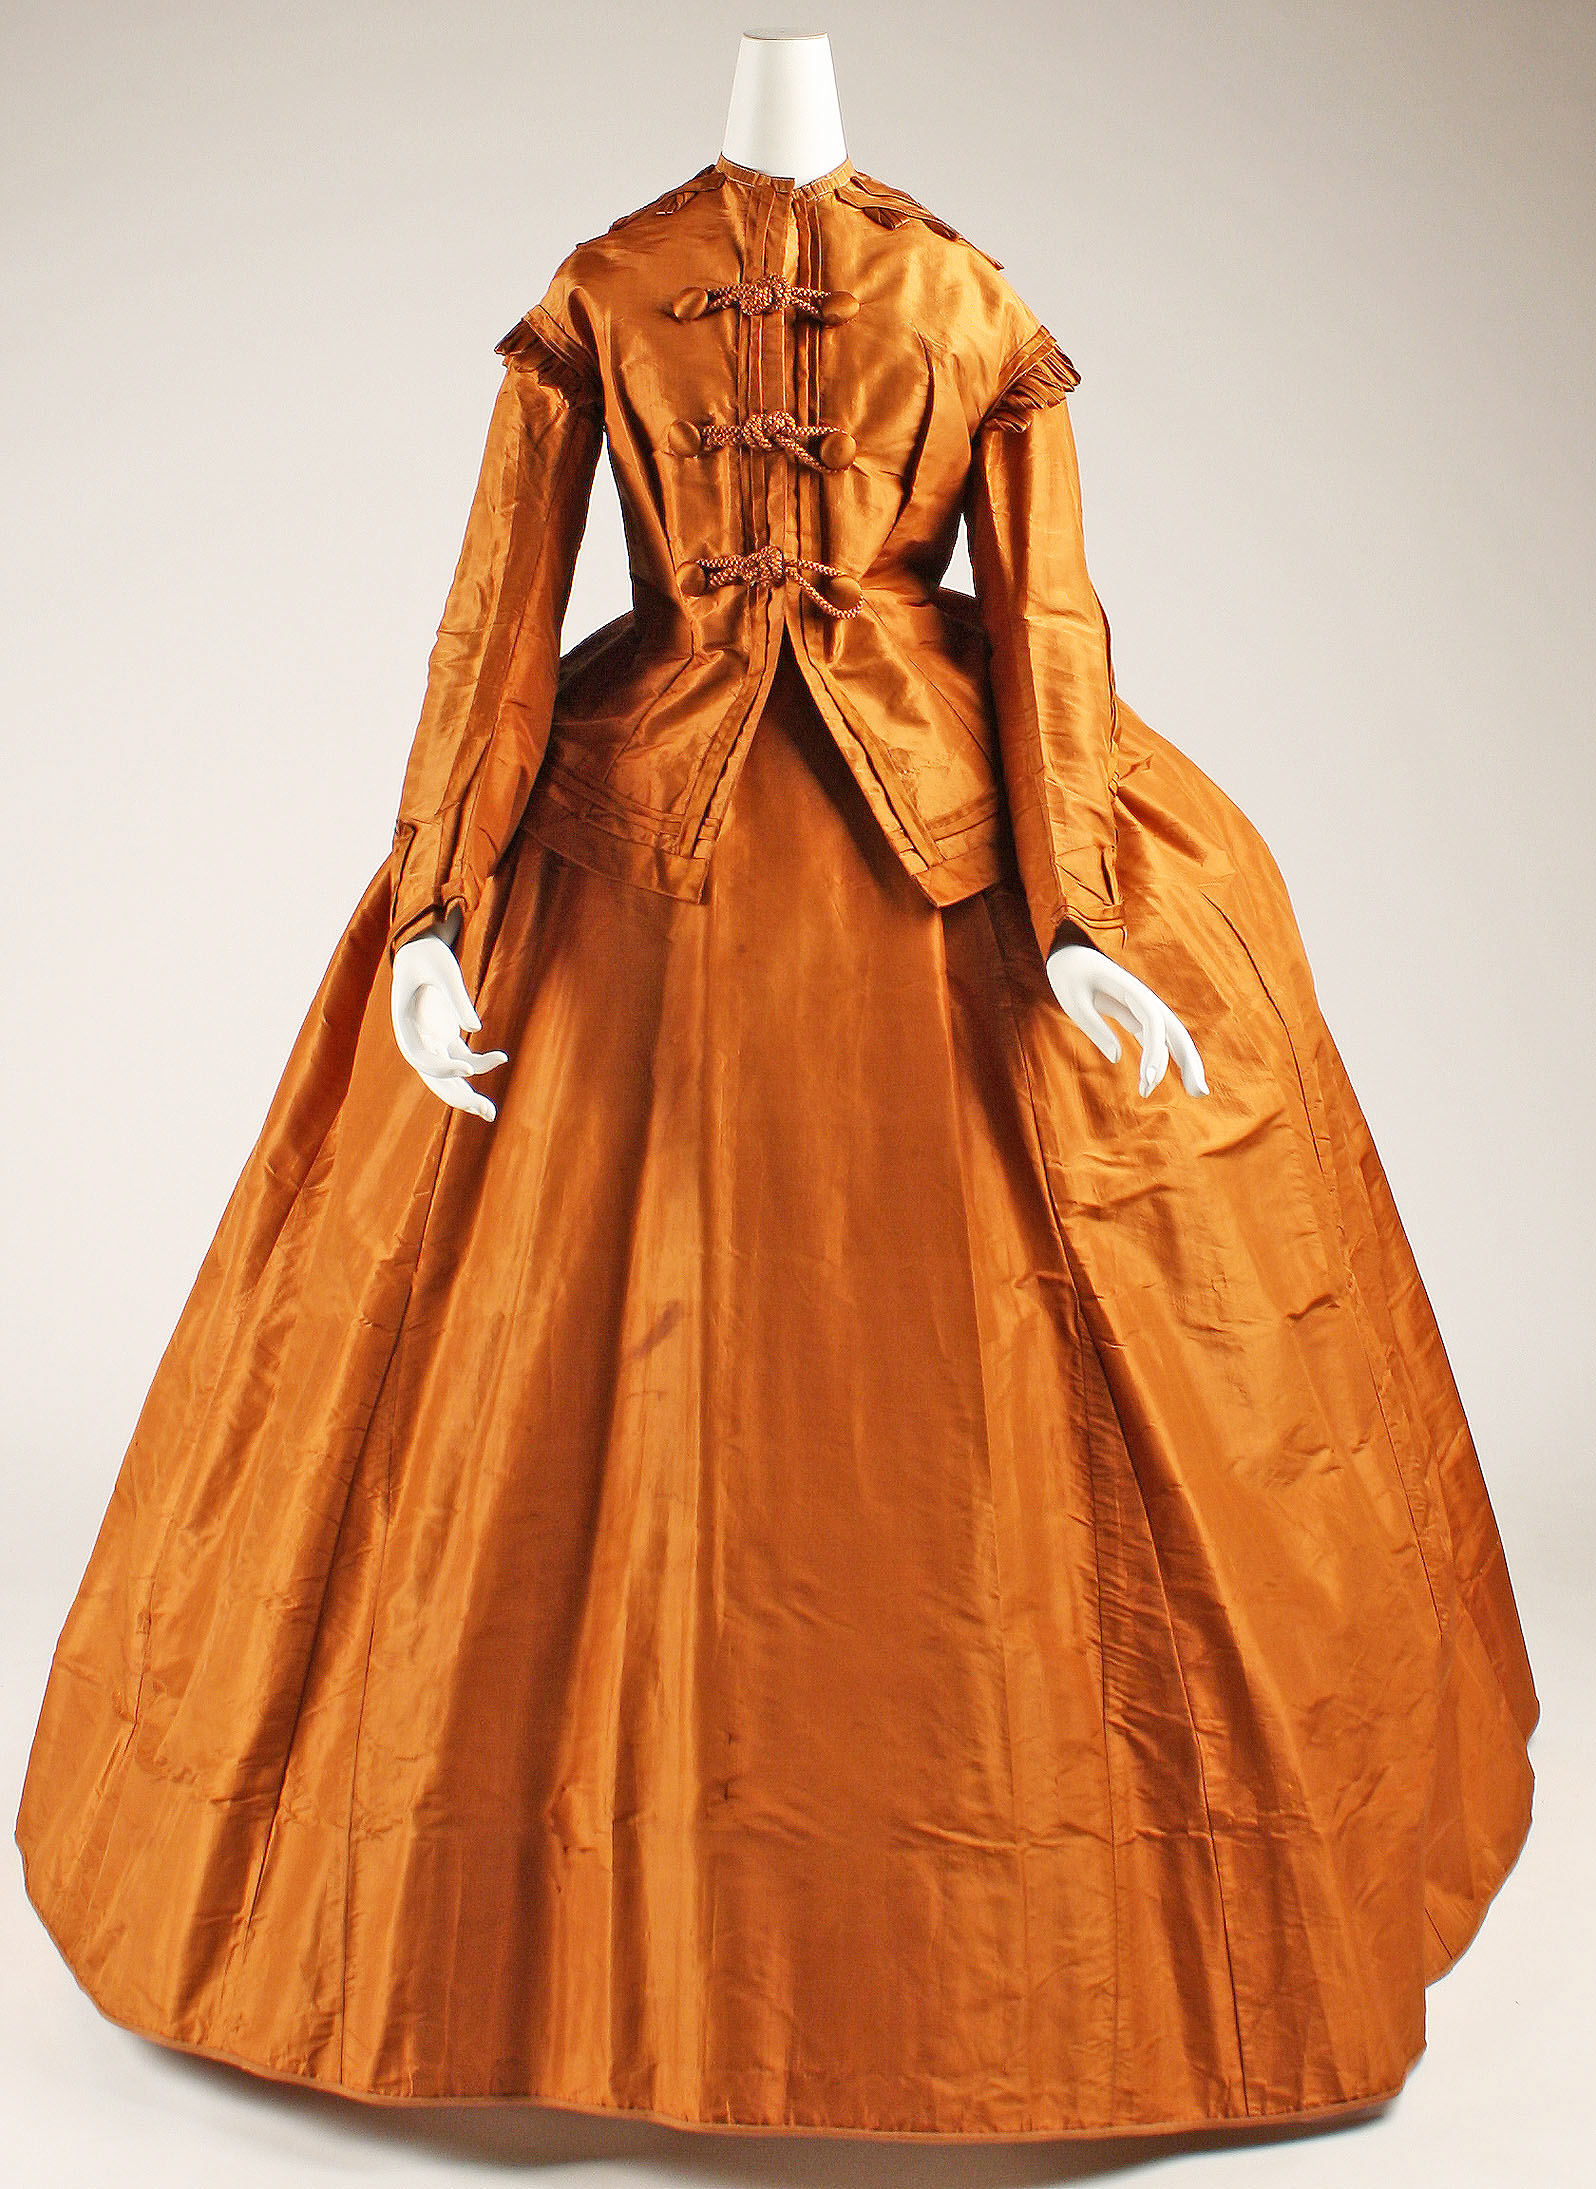 1865 1875 american silk visiting dress 1 via met museum